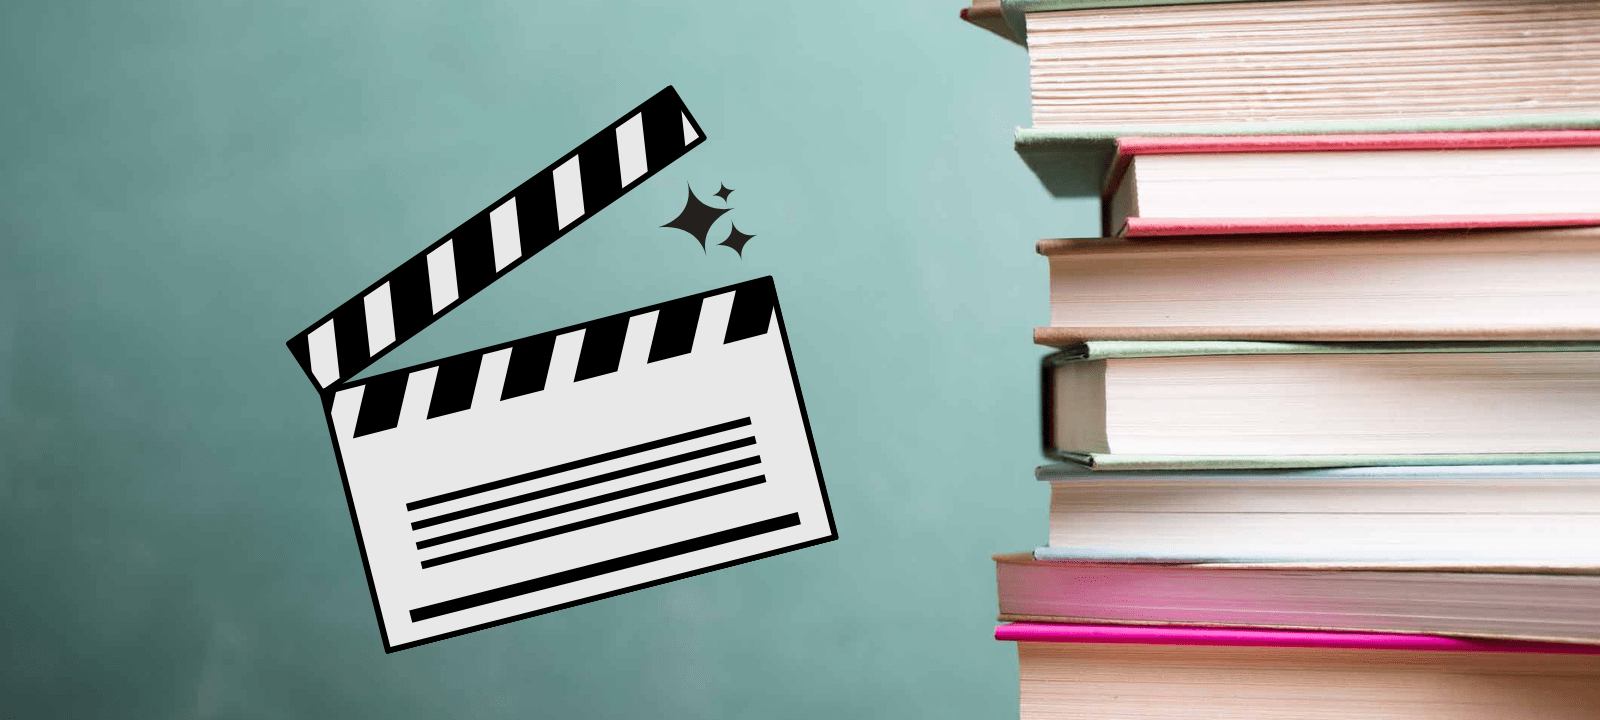 libros gratis cine